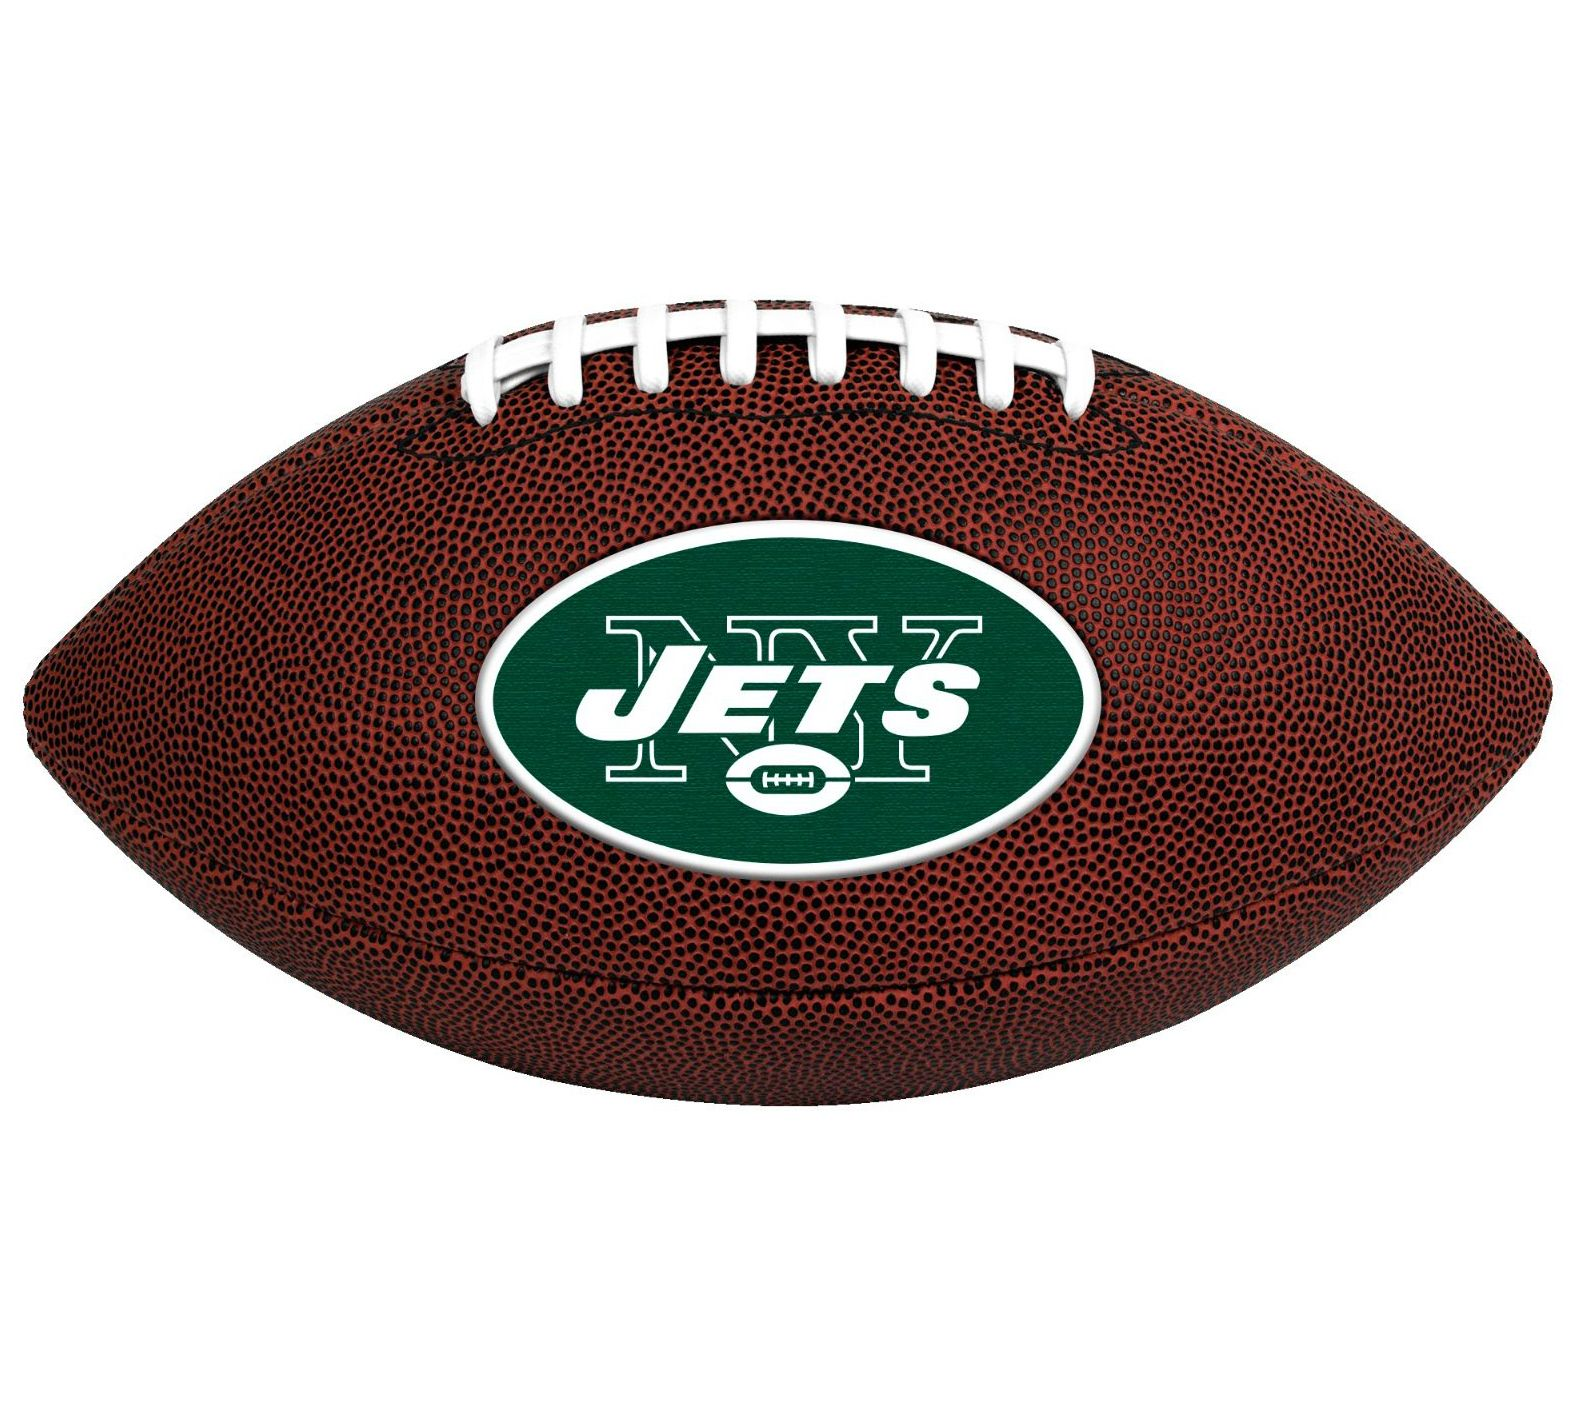 Throw the pigskin around at halftime